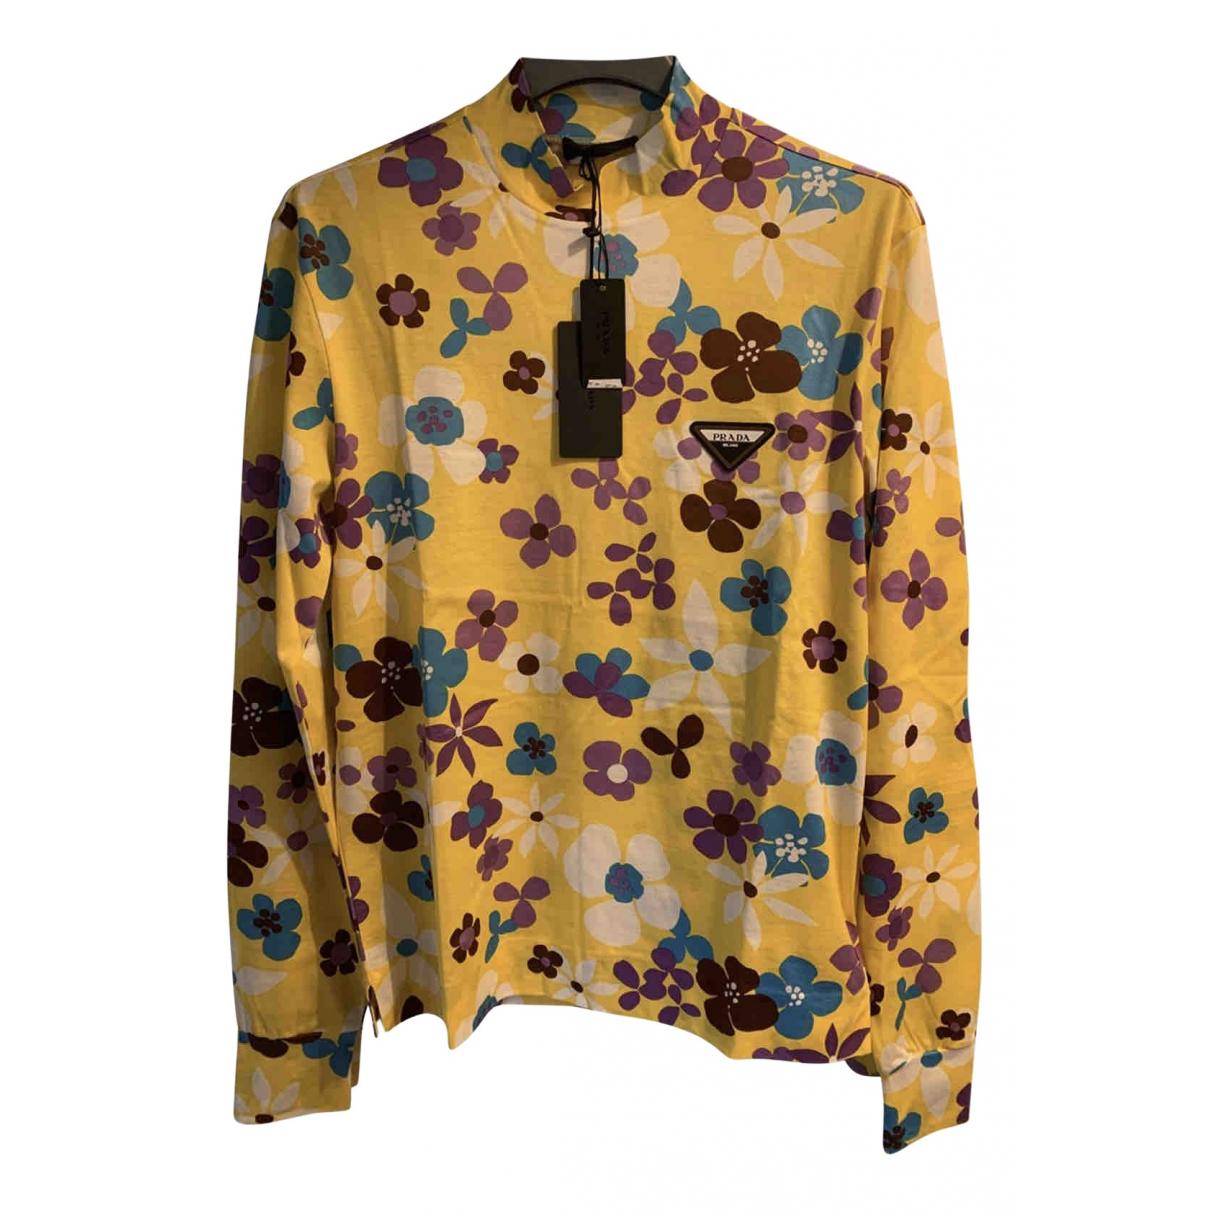 Prada - Tee shirts   pour homme en coton - jaune